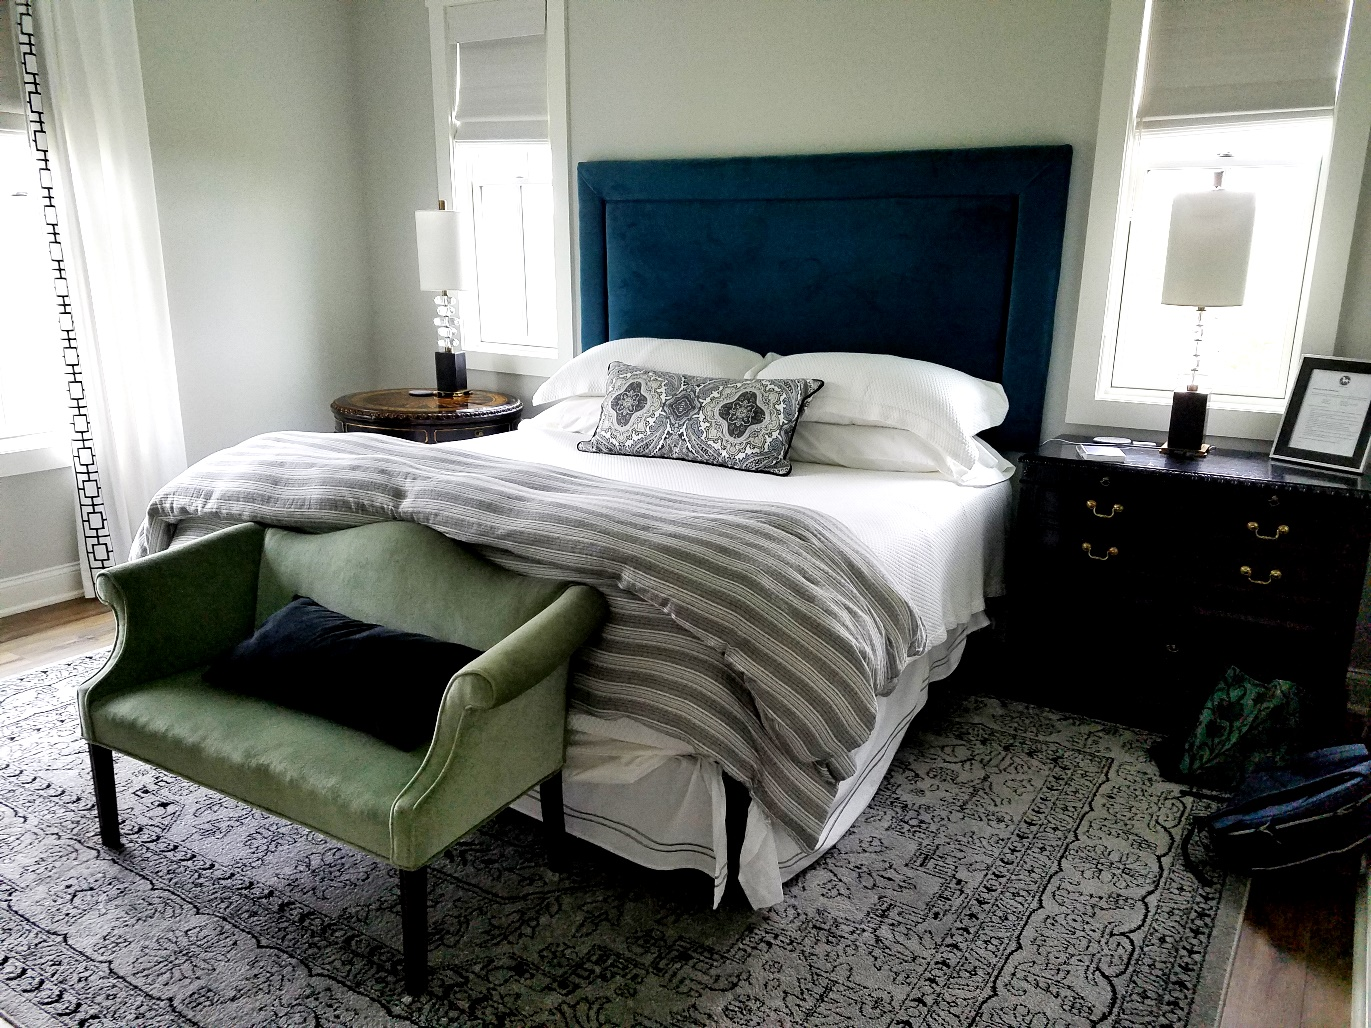 White Horse Winery Farmhouse Bedroom, The Solera Room. Wine Casual